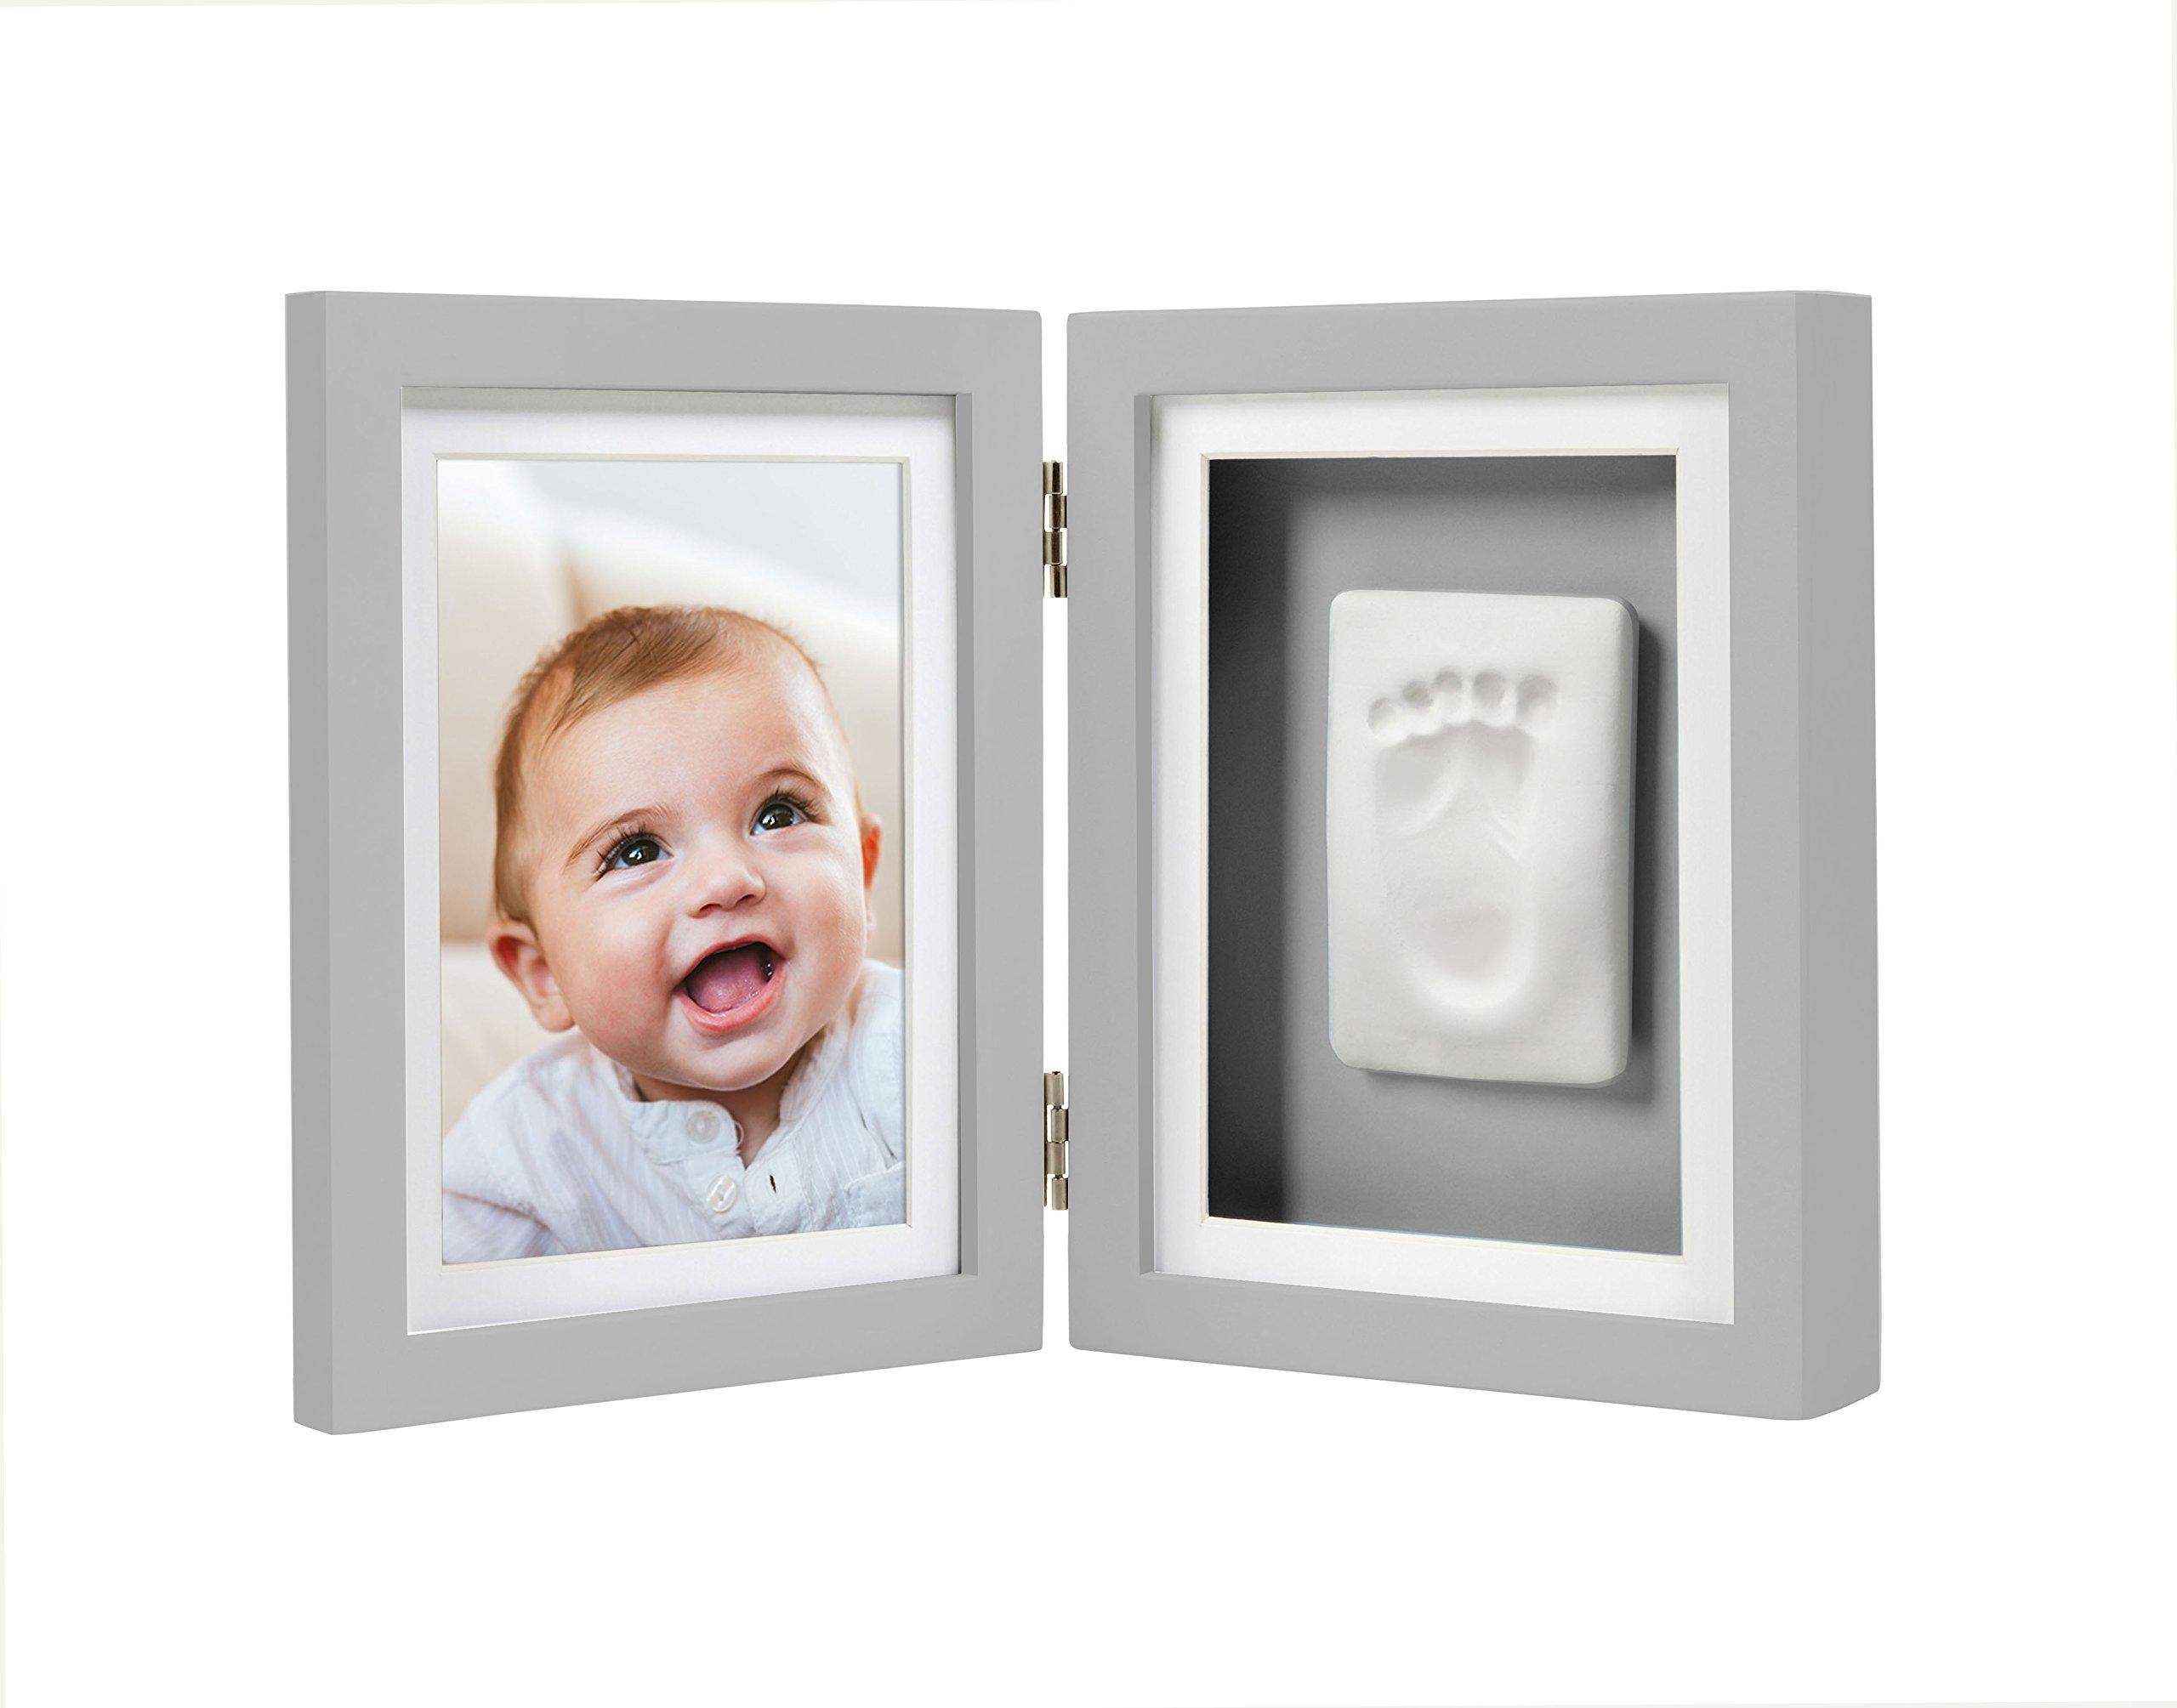 Pearhead Babyprints Newborn Baby Handprint and Footprint Desk Photo Frame & Impression Kit, Gray by Pearhead